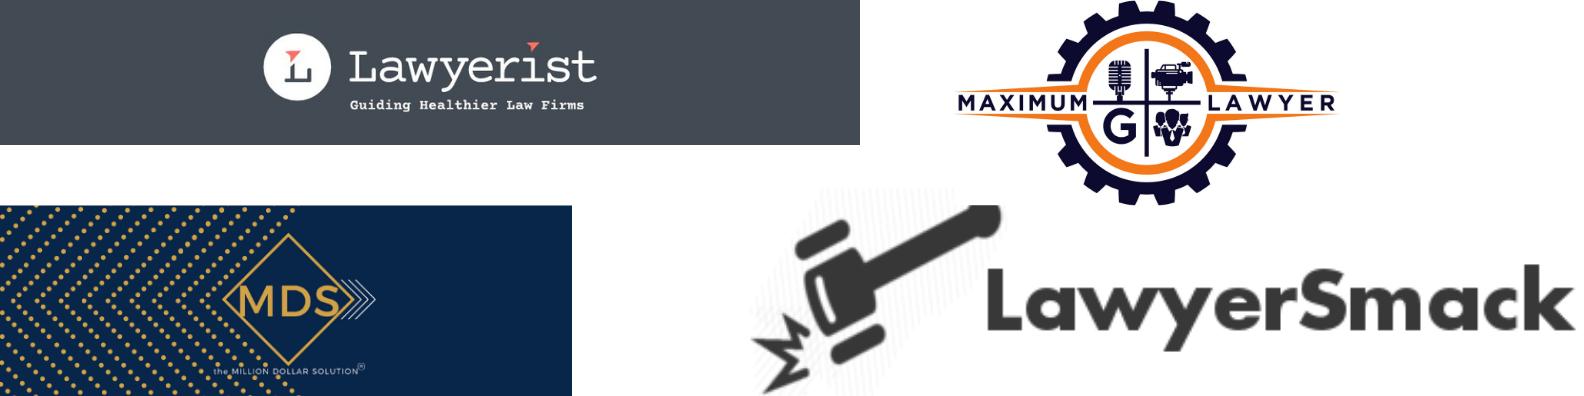 Lawyer community logos